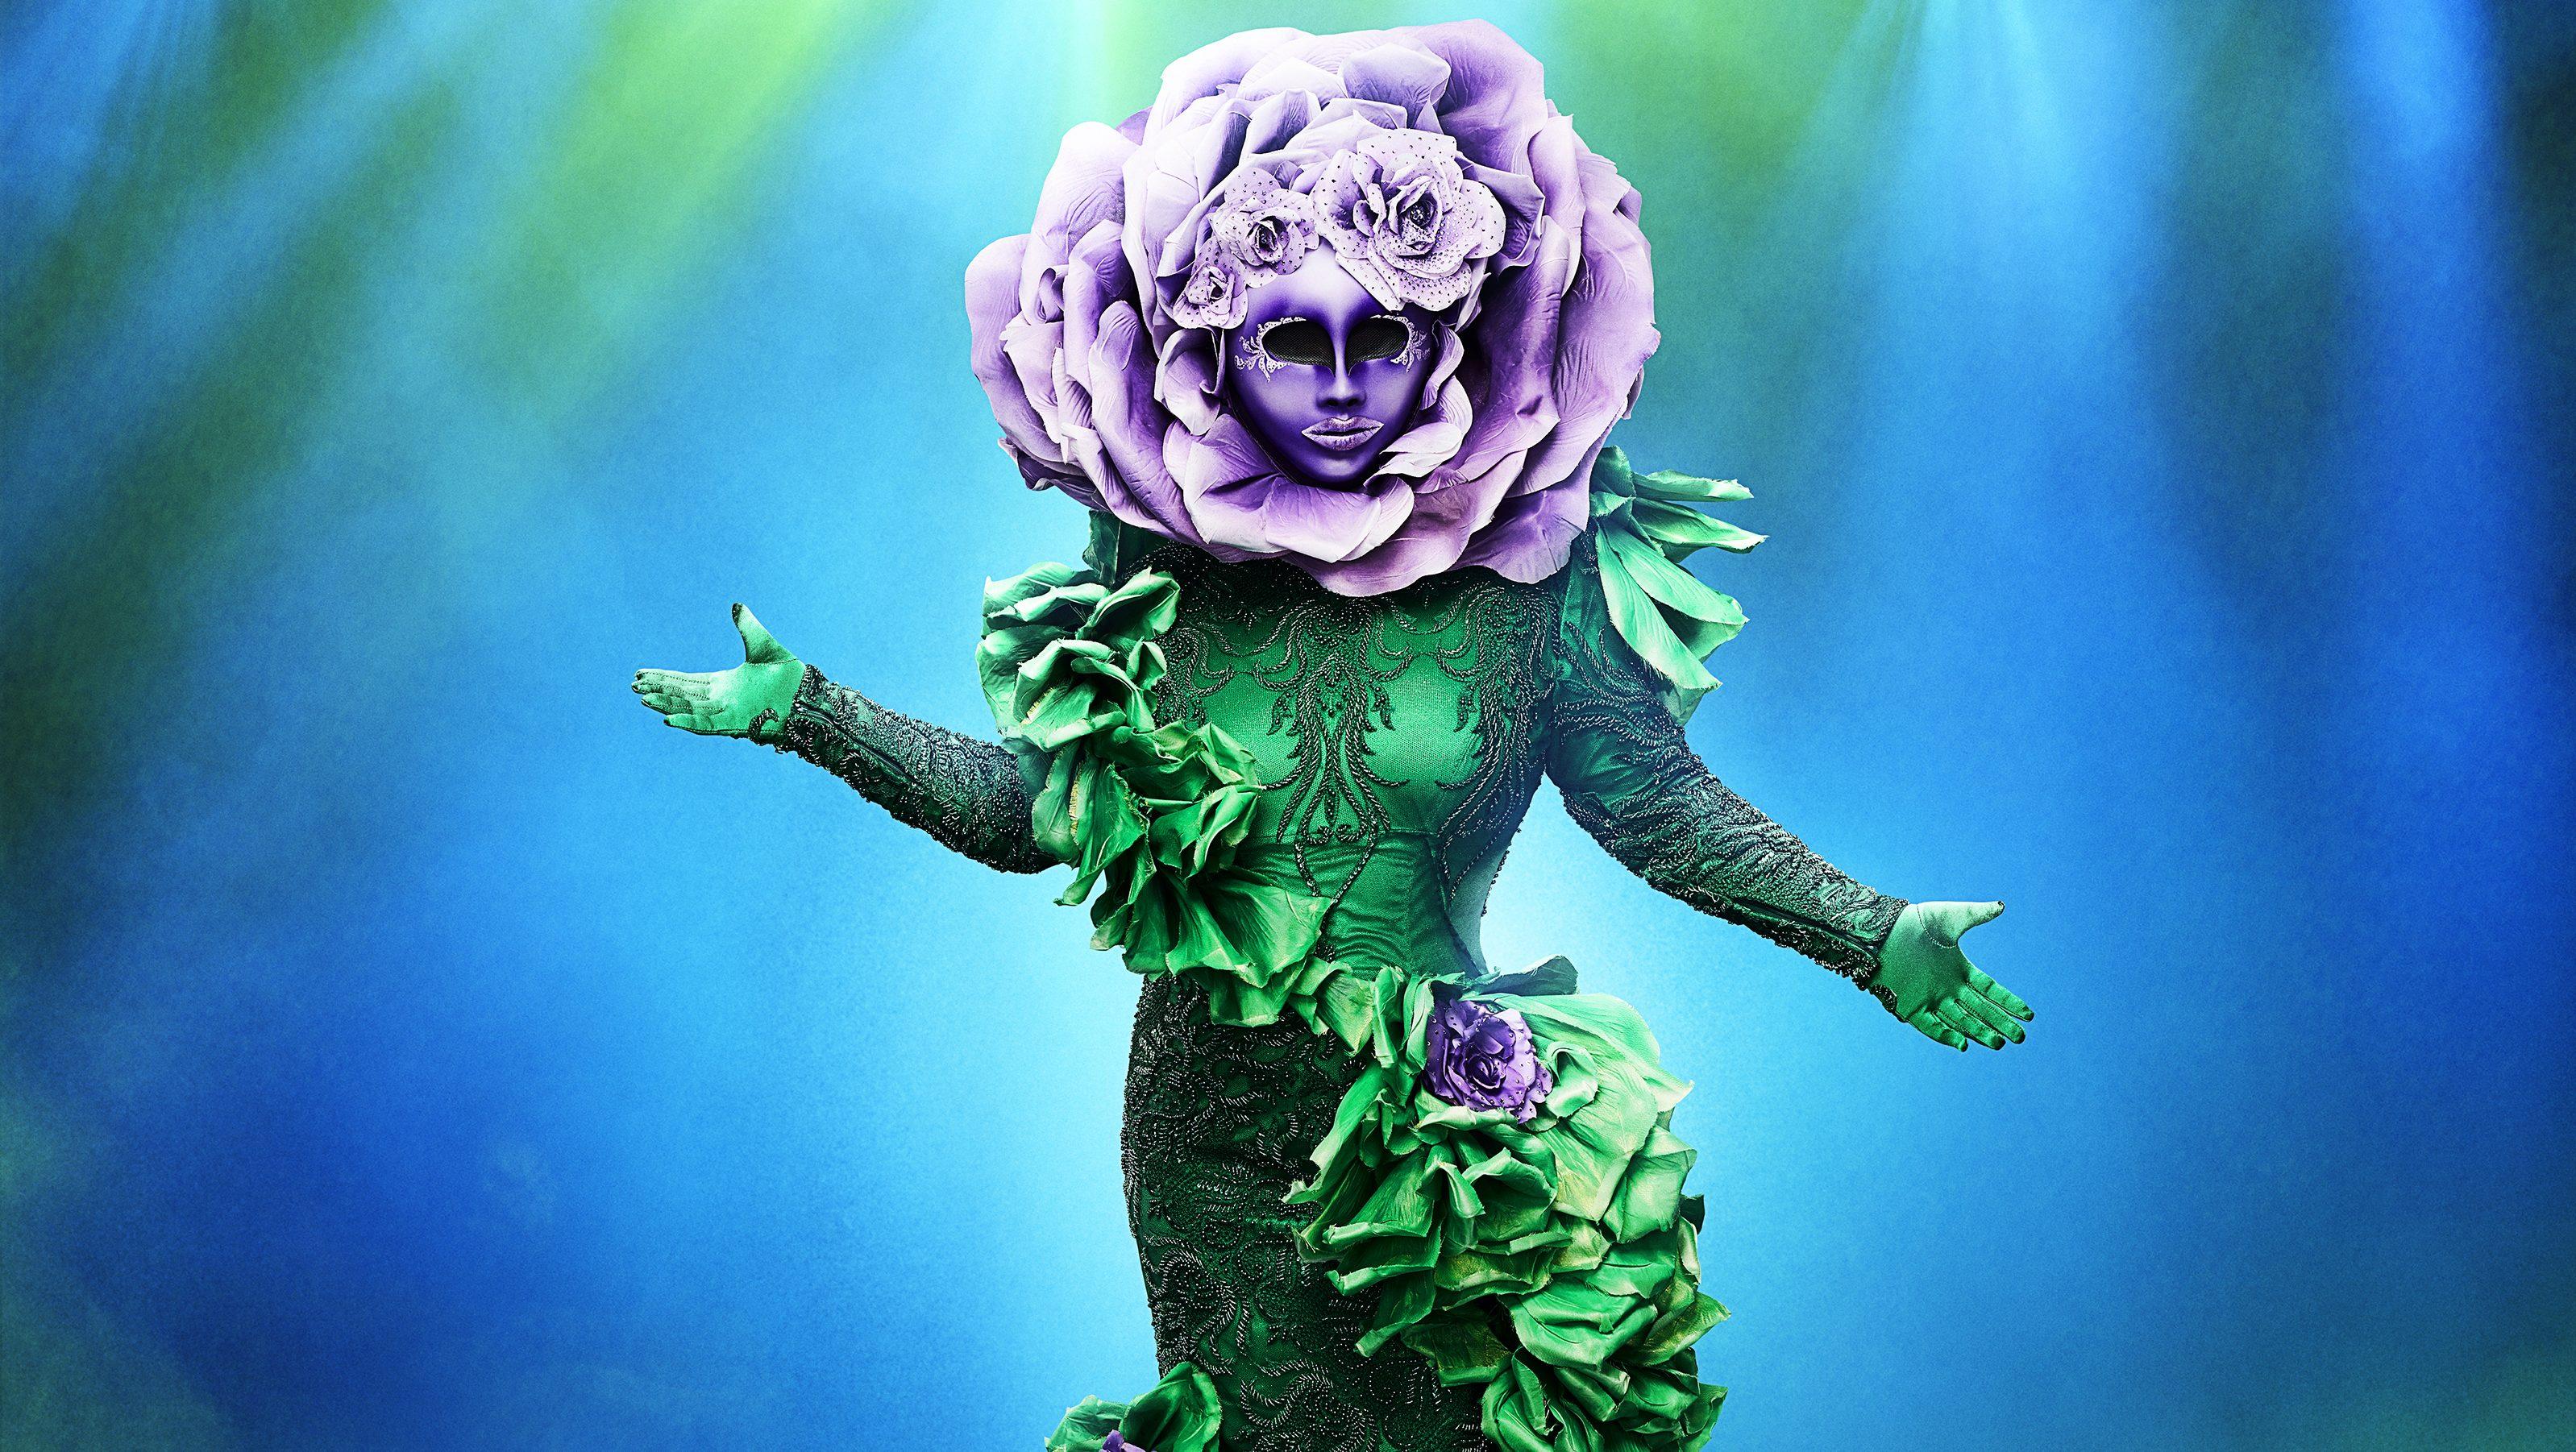 The Masked Singer Flower